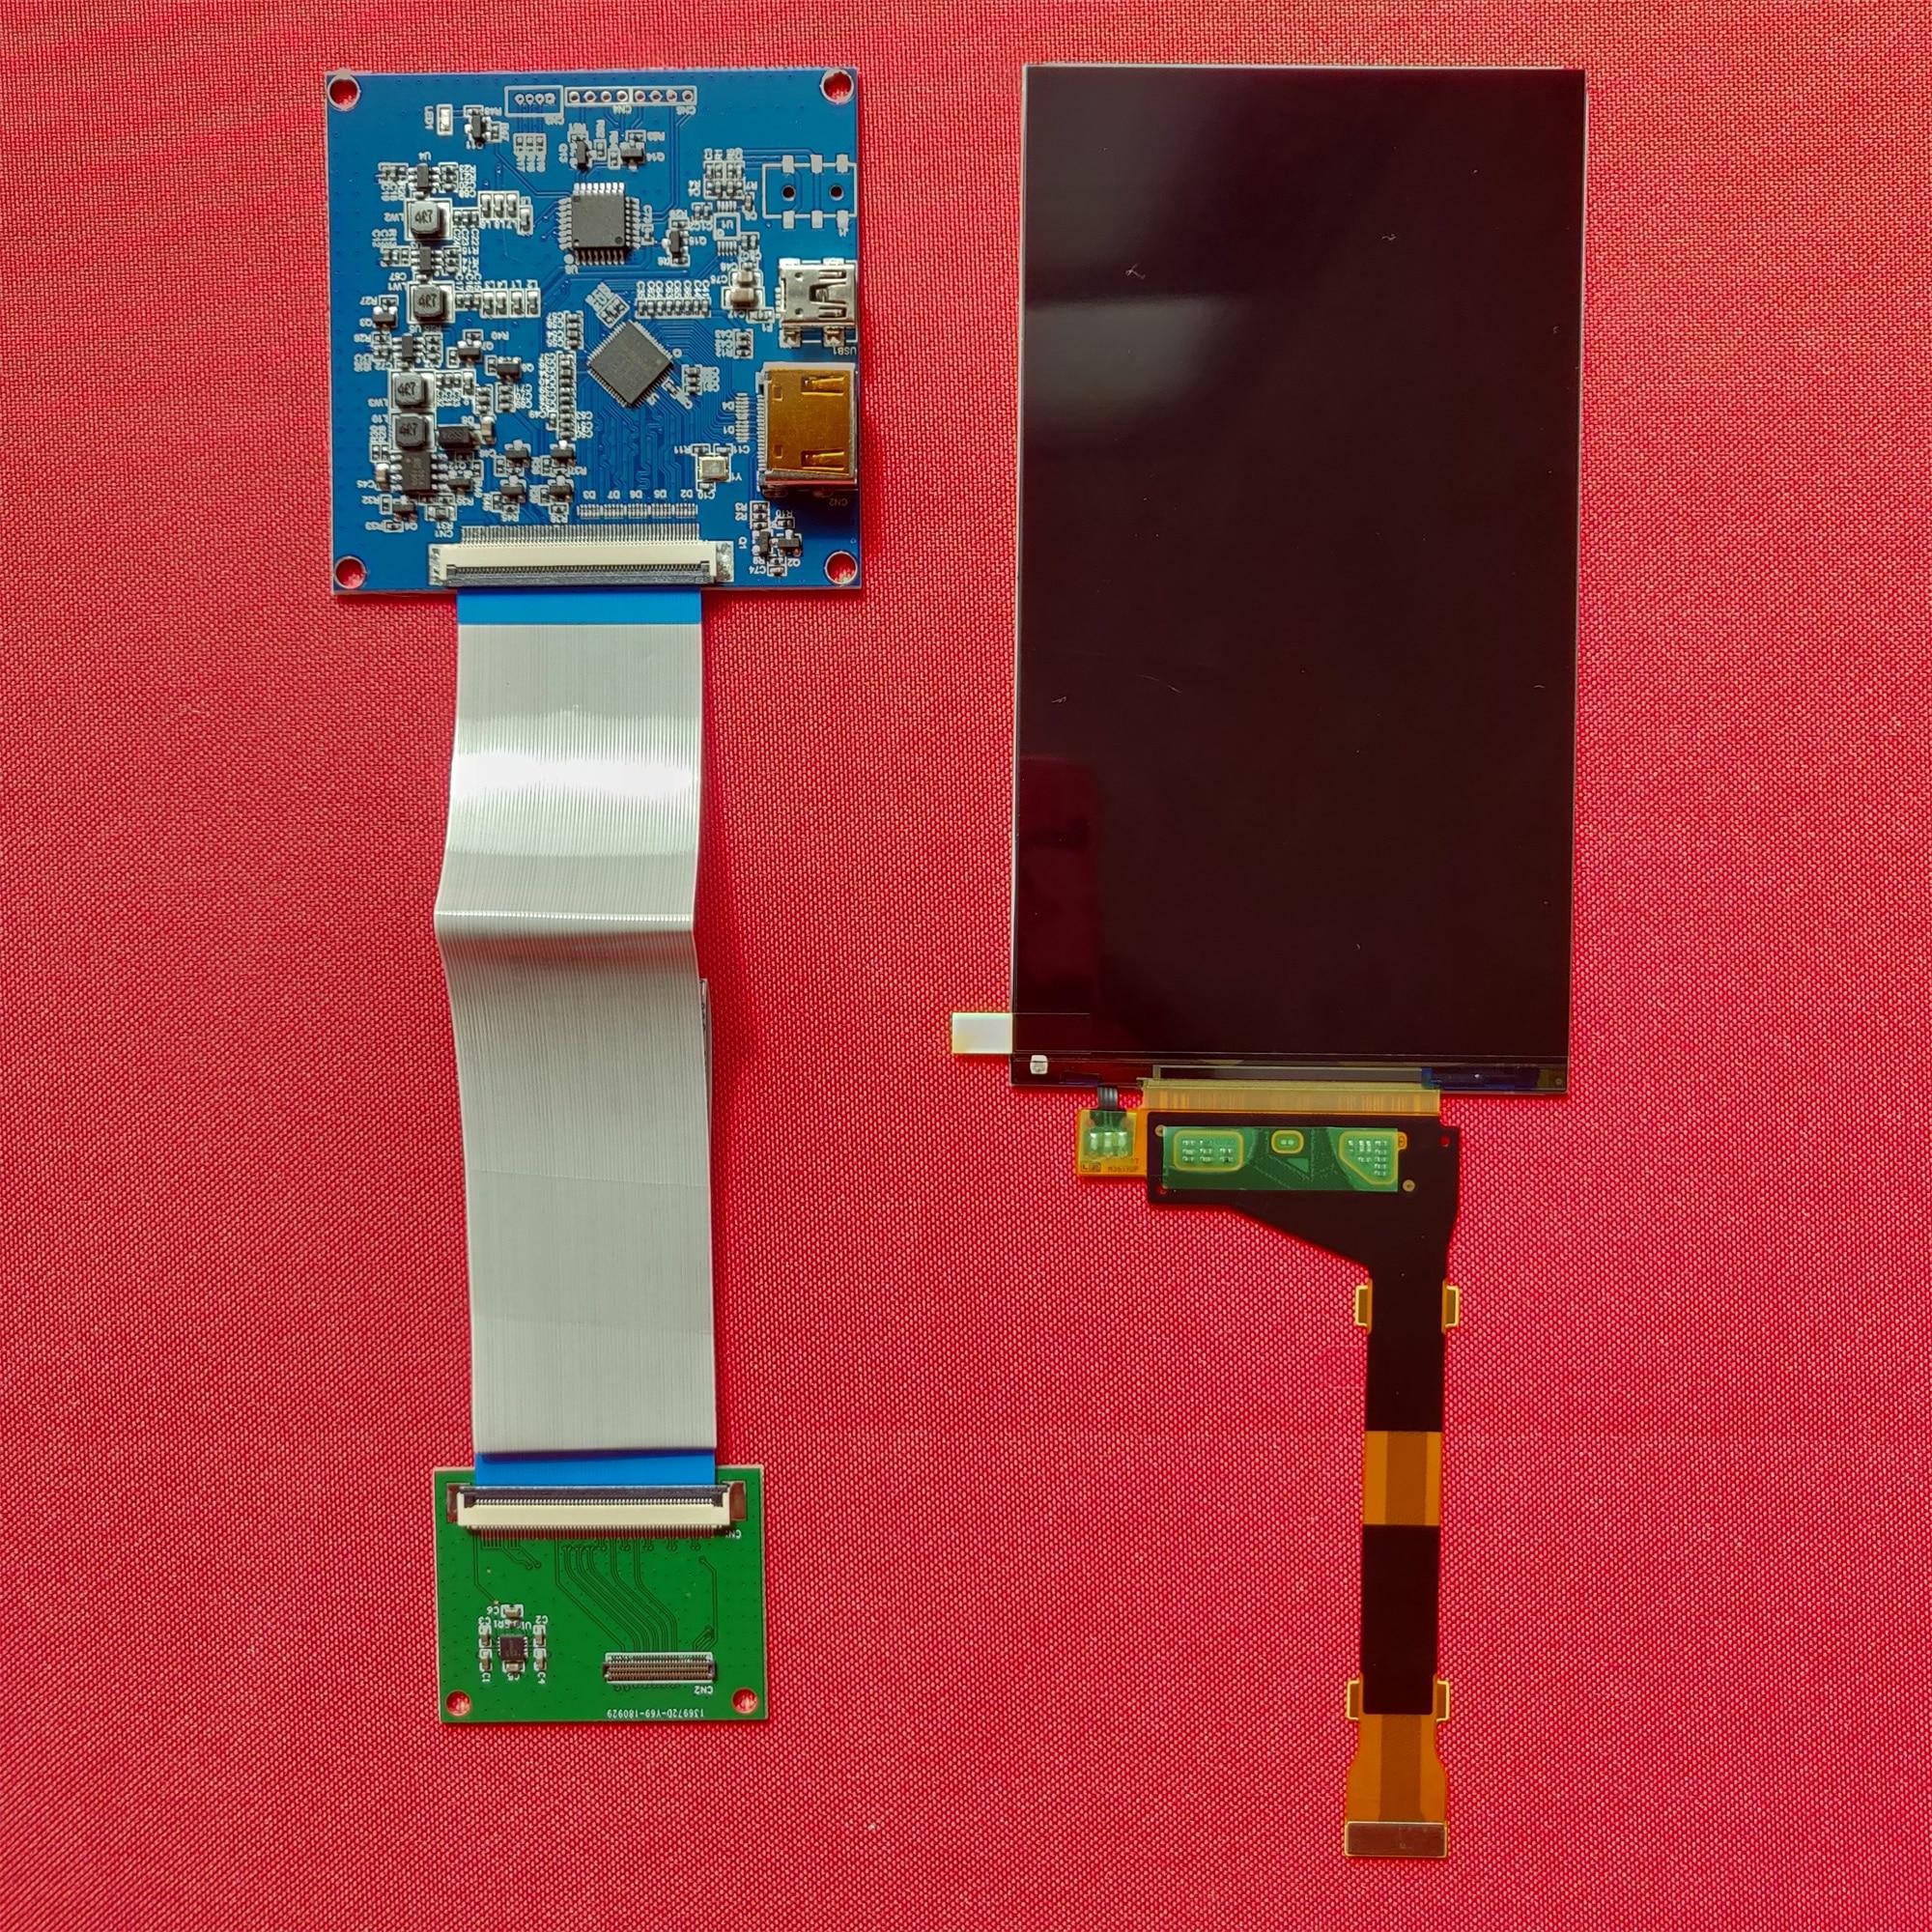 Экран 5,5 дюйма 1440p hdmi дисплей 1440*2560 с hdmi к mipi для DIY SLA 3d принтера raspberry pi 3 pi 4b LS055R1SX03